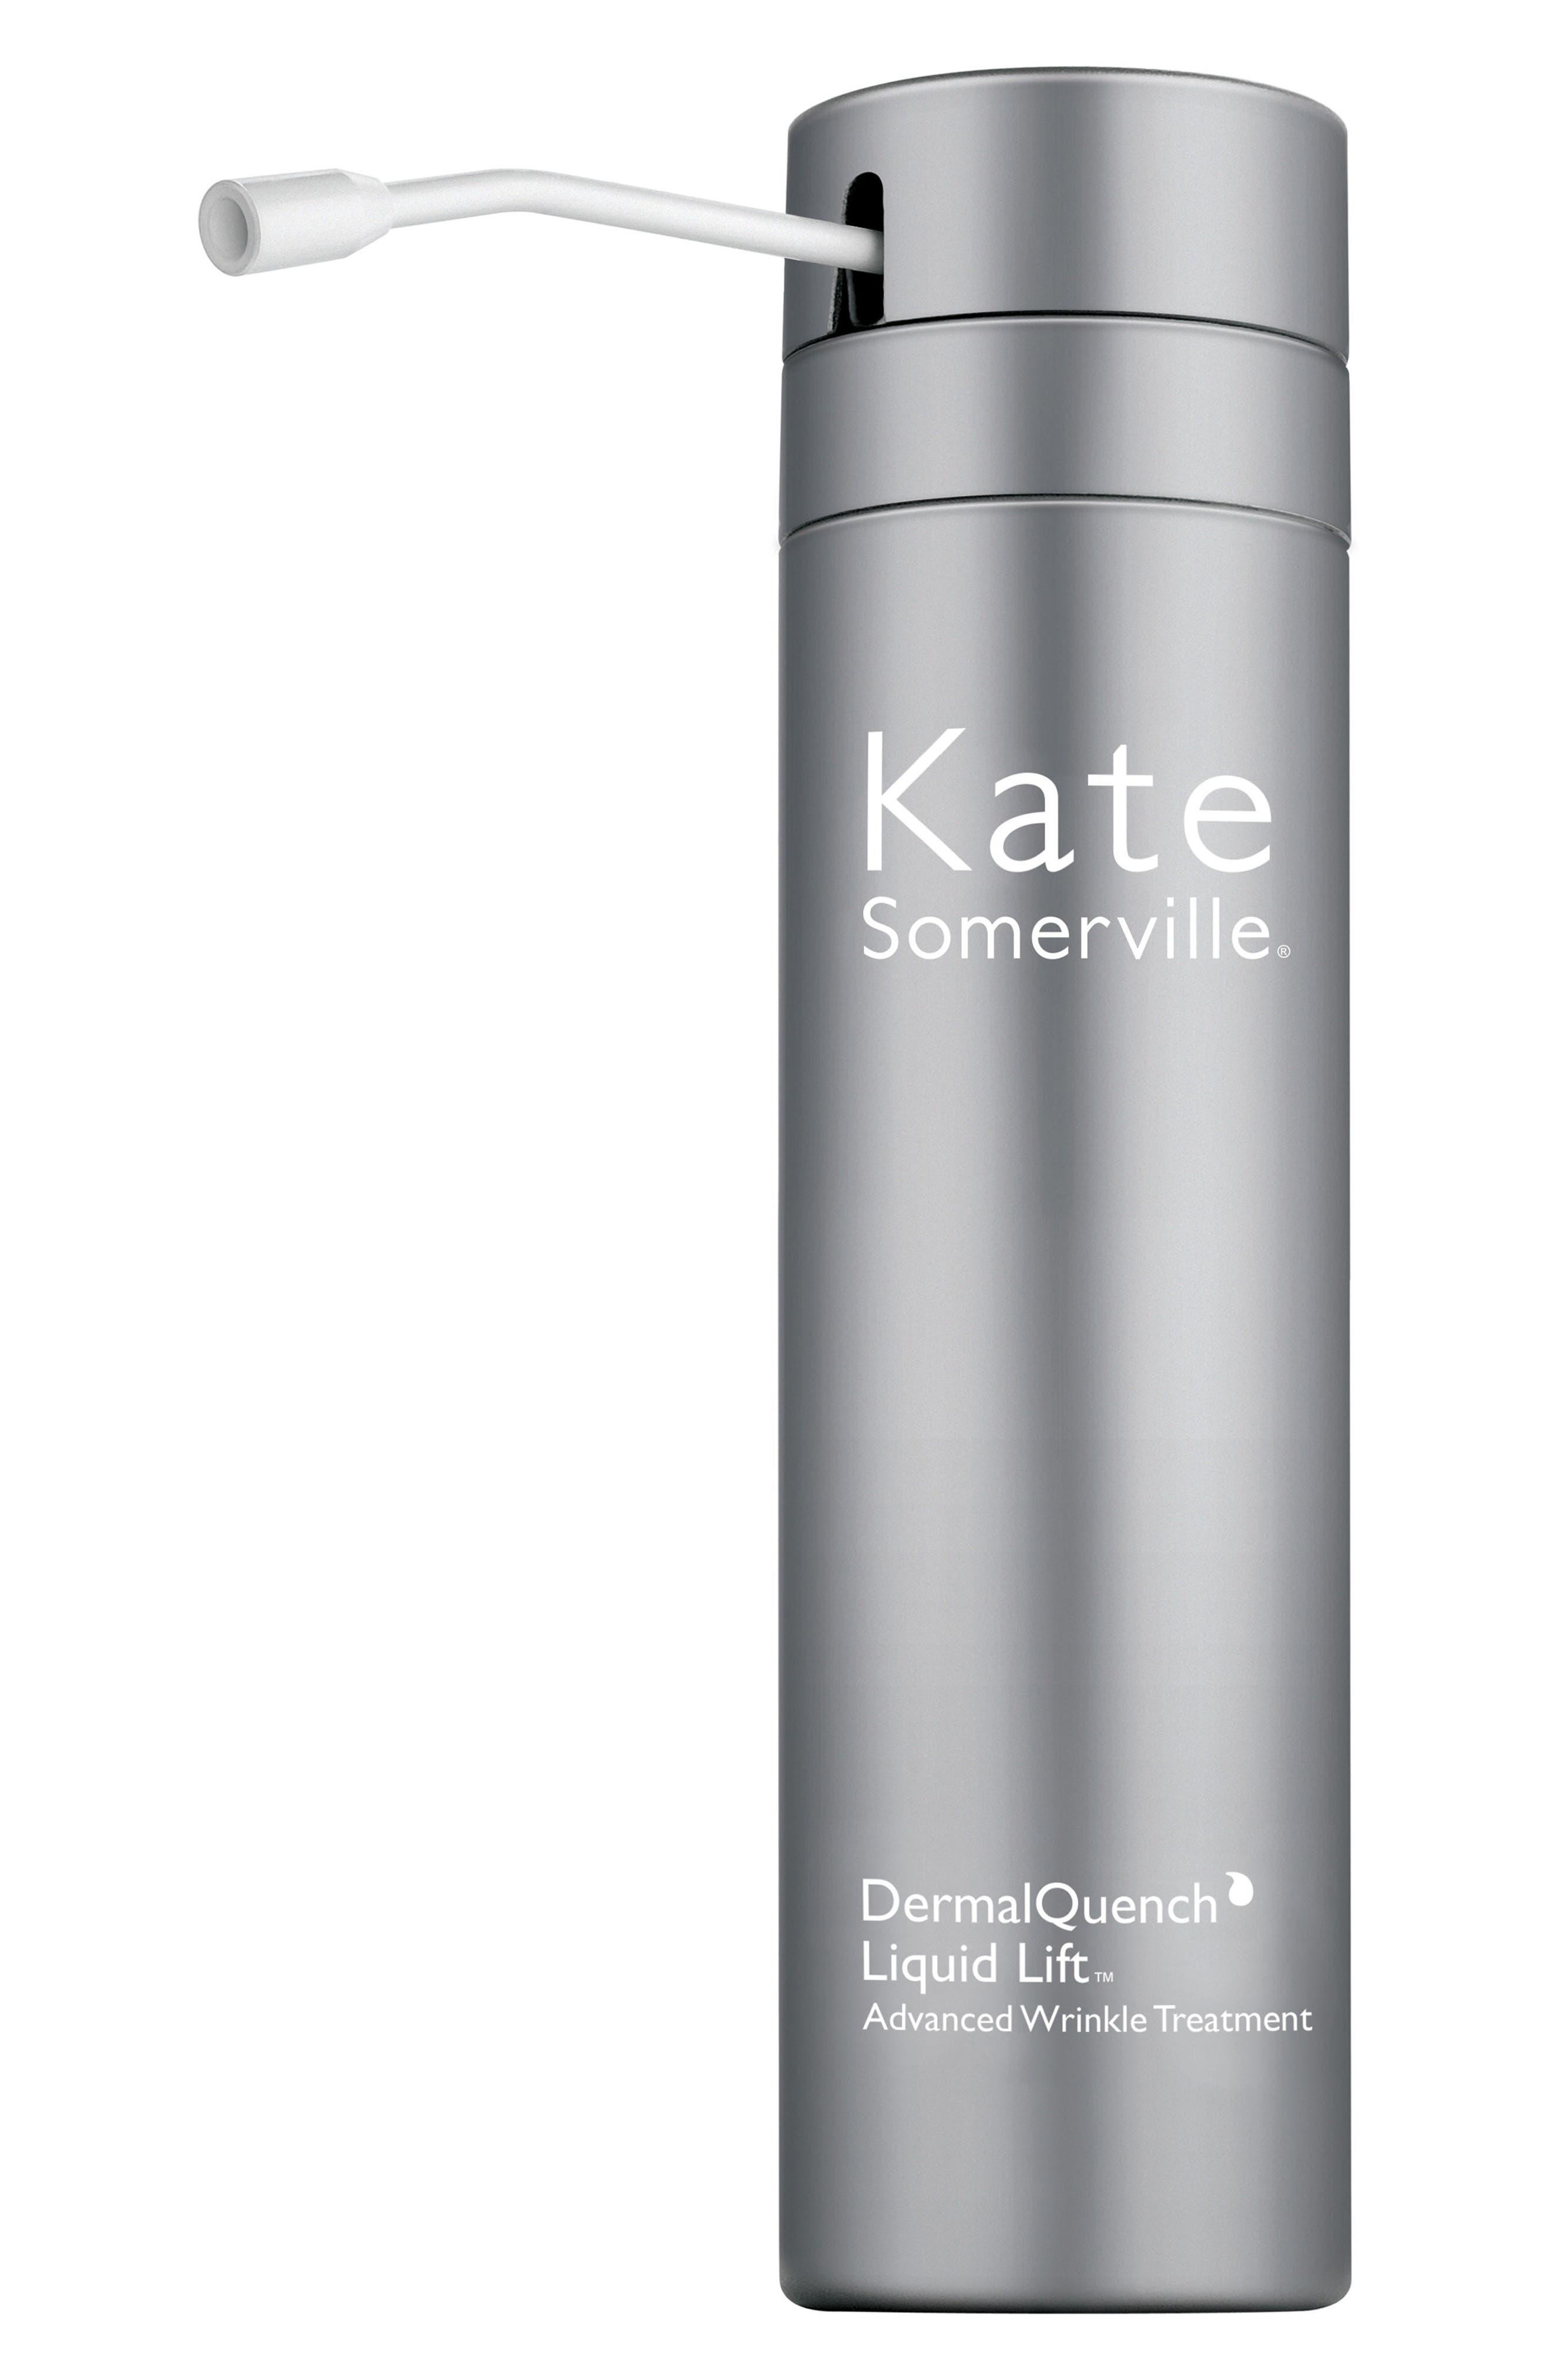 Alternate Image 1 Selected - Kate Somerville® DermalQuench Liquid Lift™ Advanced Wrinkle Treatment